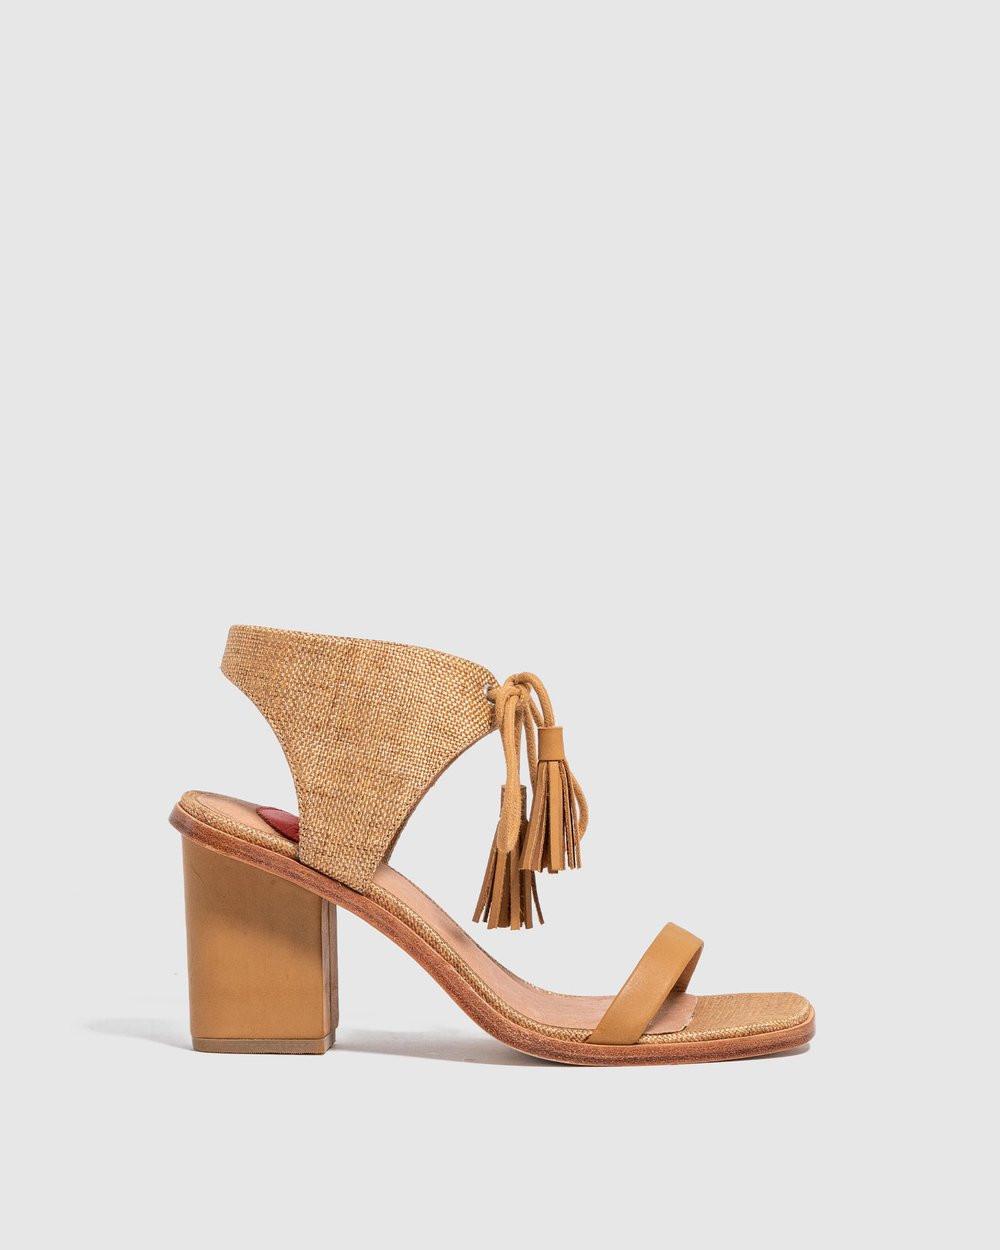 Everyday Shoe Australian Fashion Designer, Simple Shoe